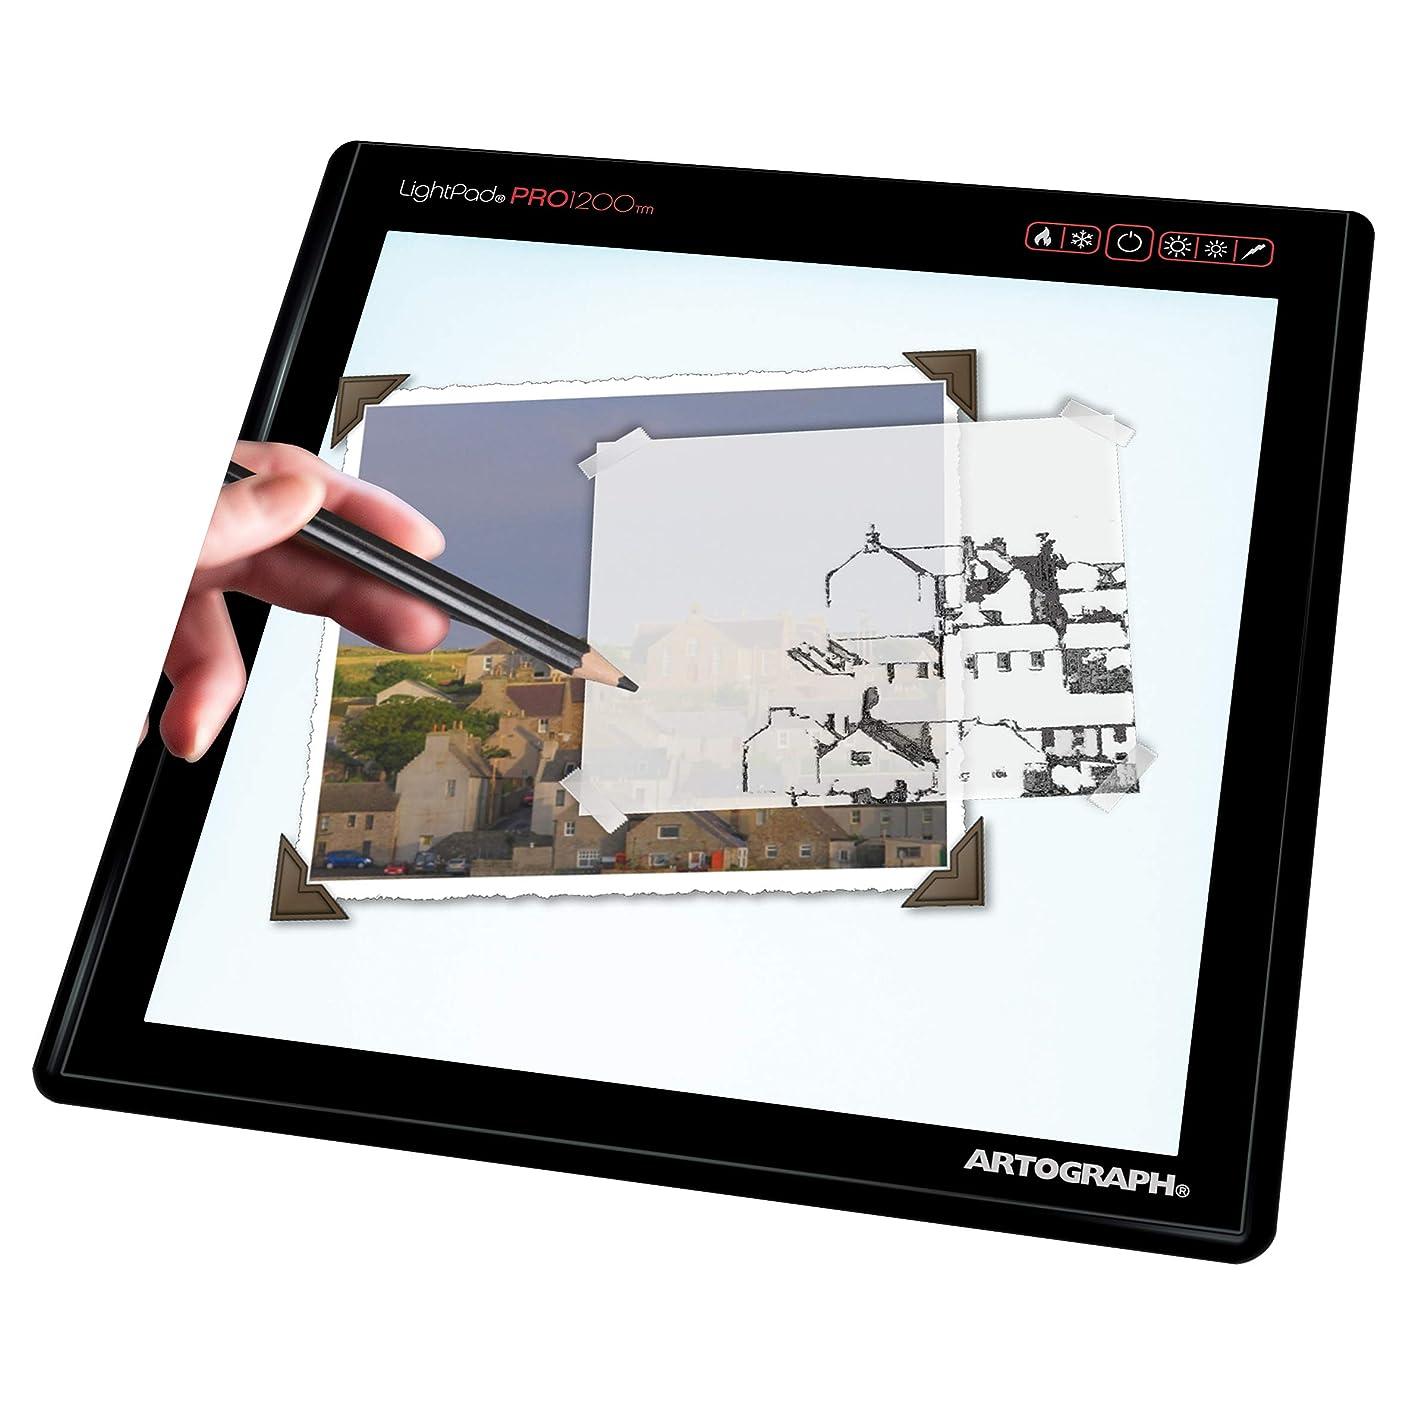 Artograph PRO1200 LightPad, 12 x 12 lit Area